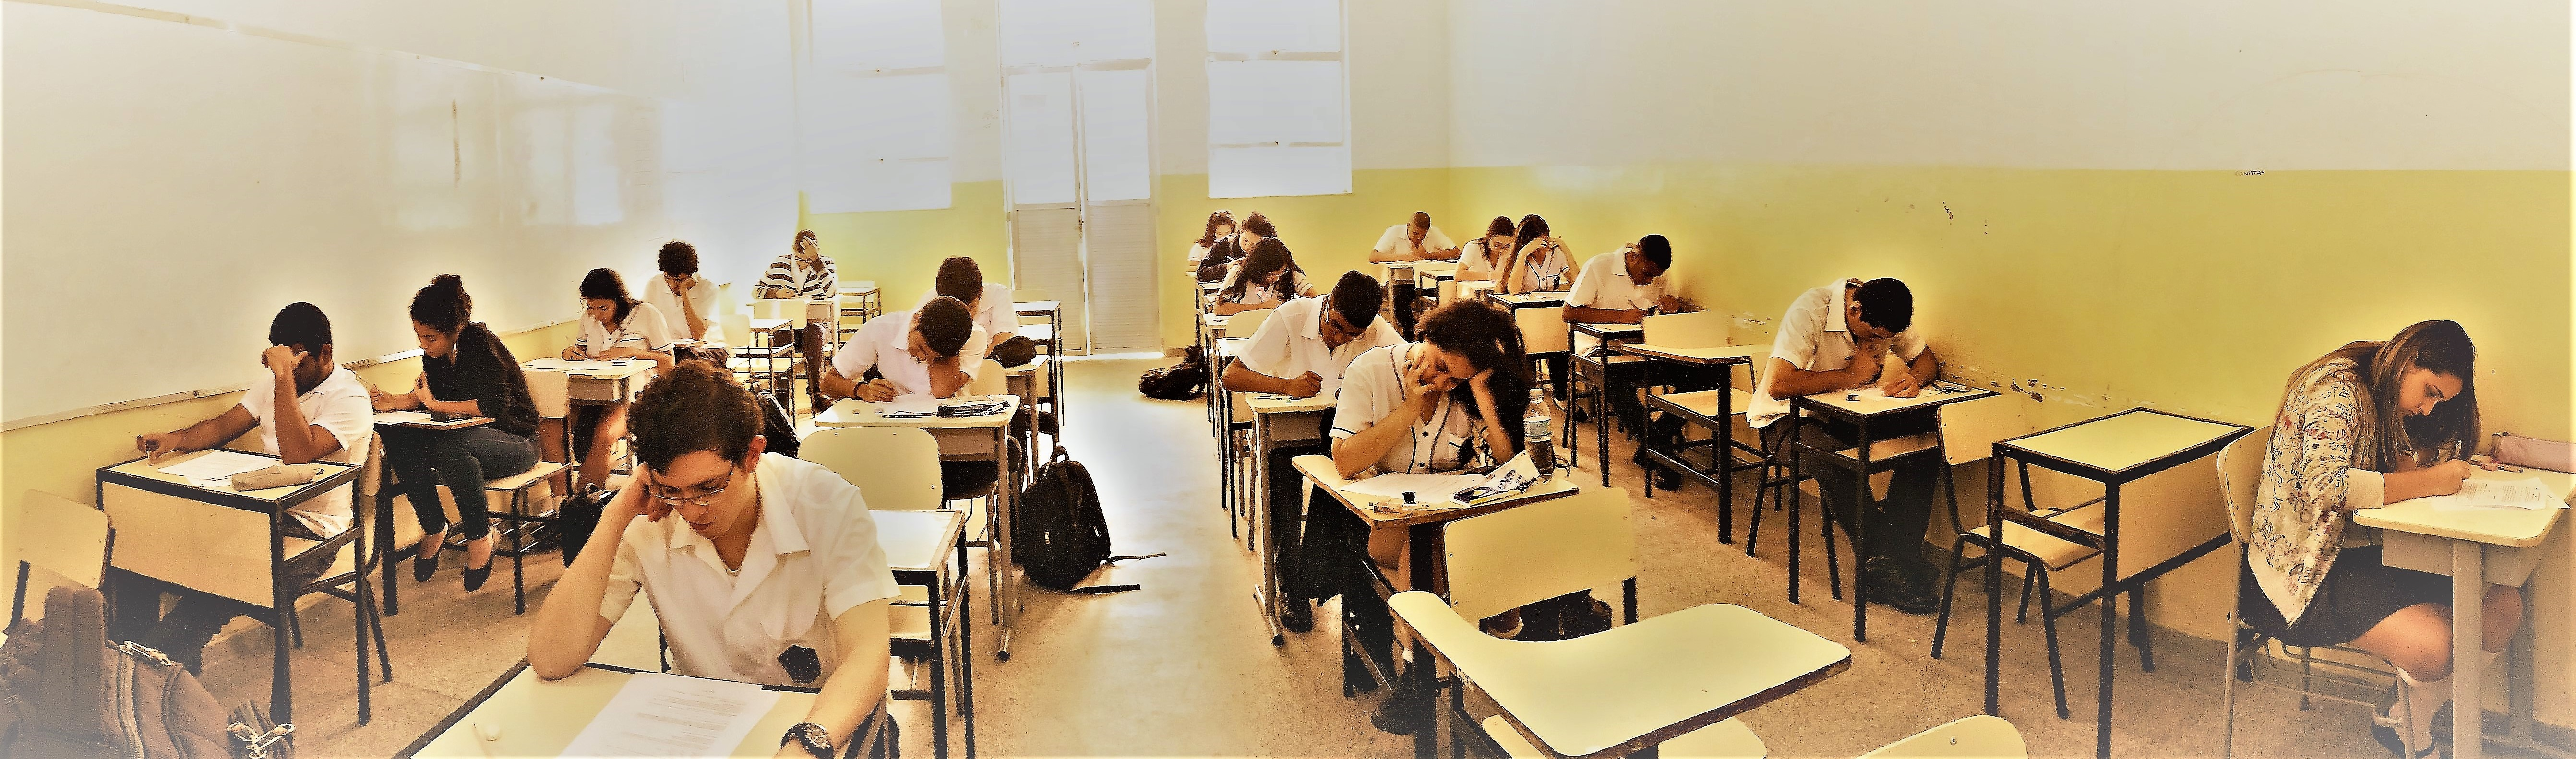 1ª fase OQRJ 2016 - Colégio Pedro II, Realengo II